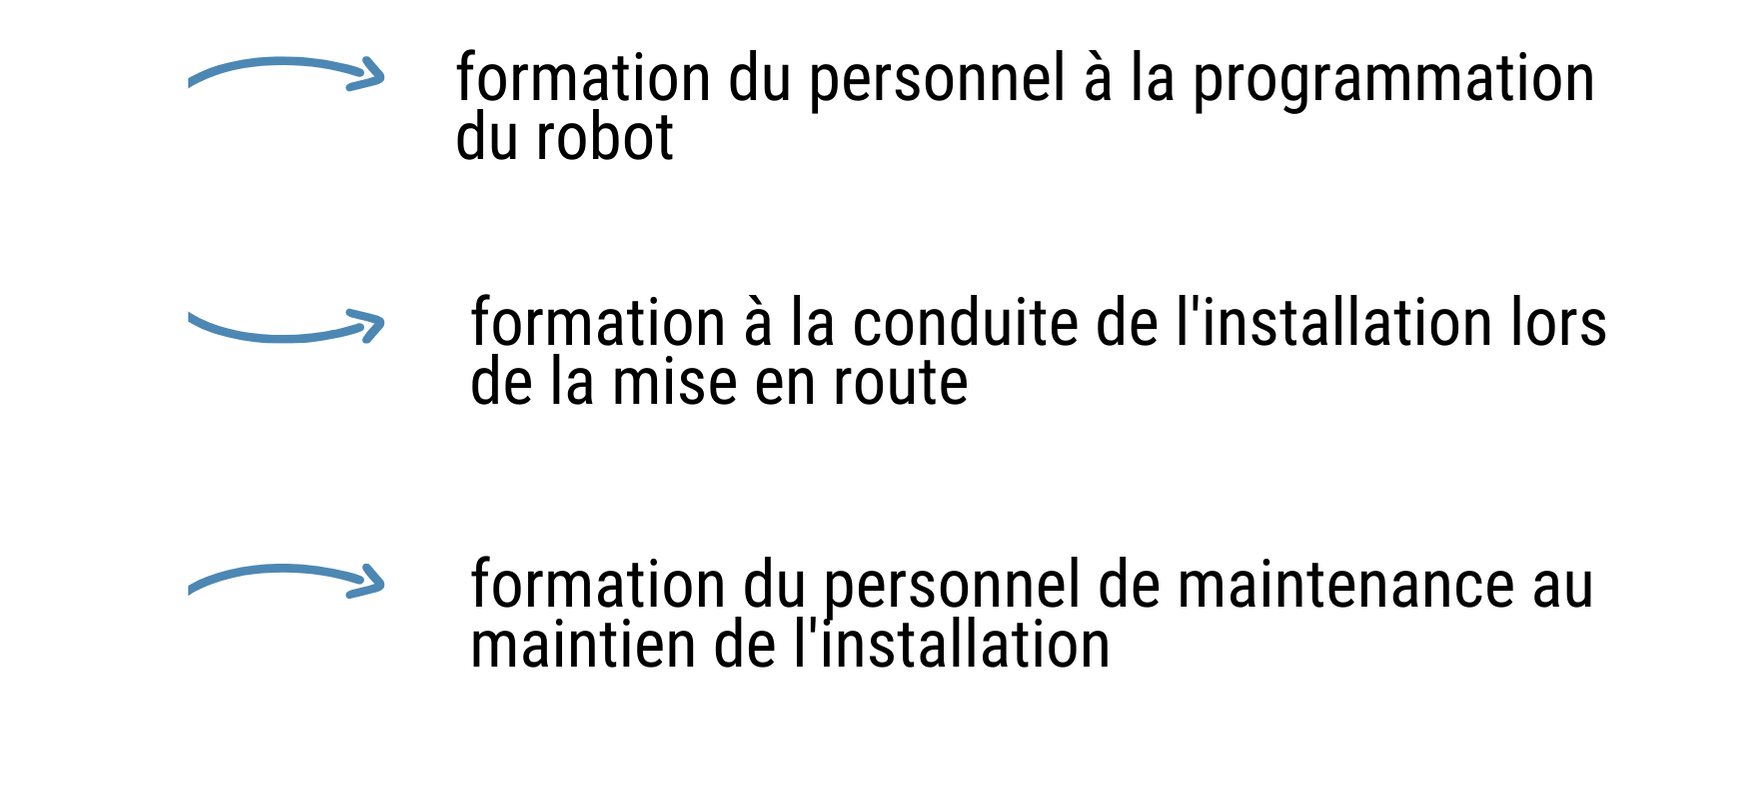 robotique collaborative formation